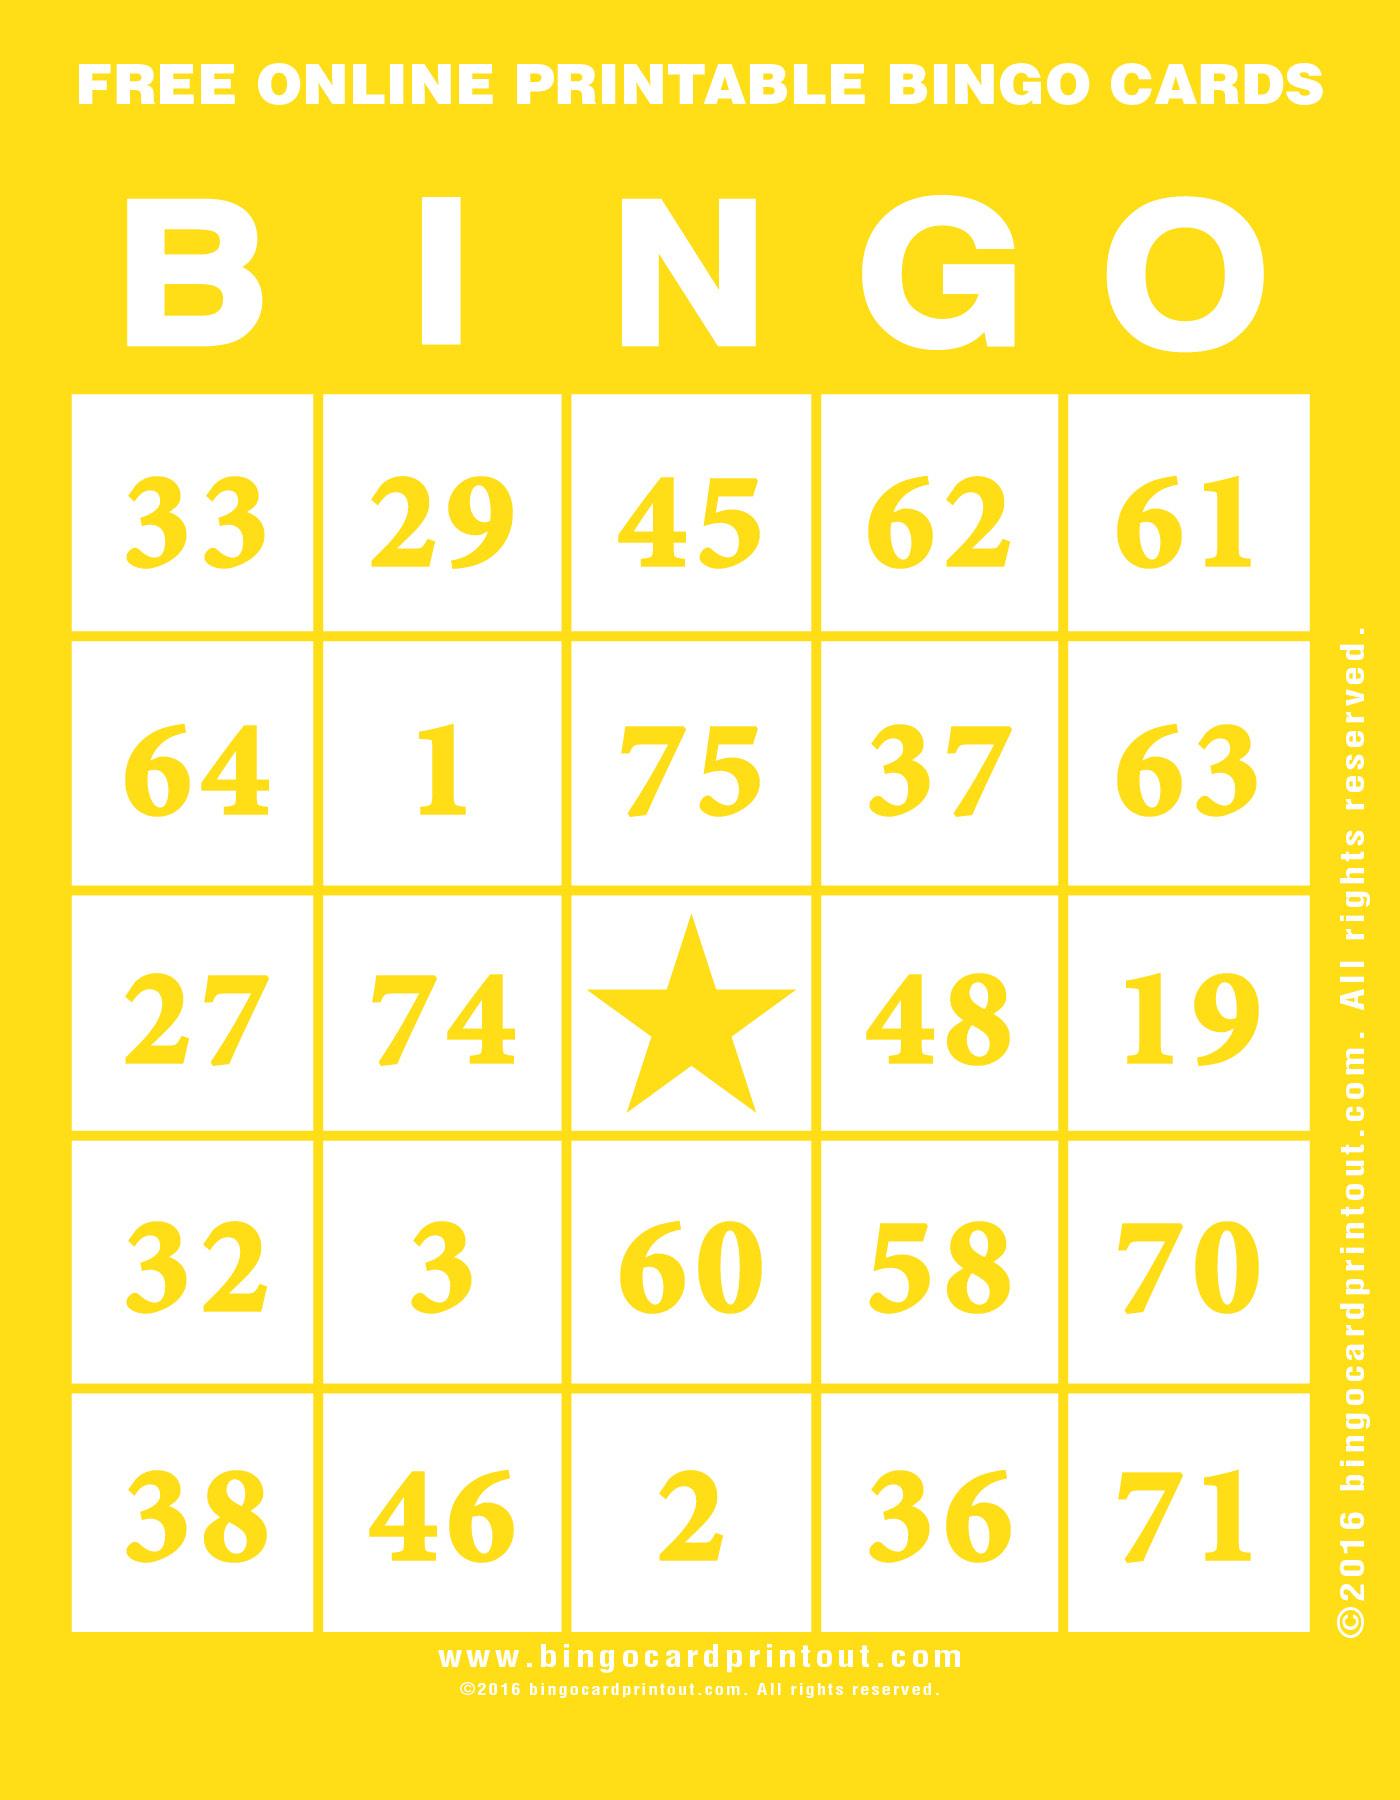 Free Online Printable Bingo Cards - Bingocardprintout